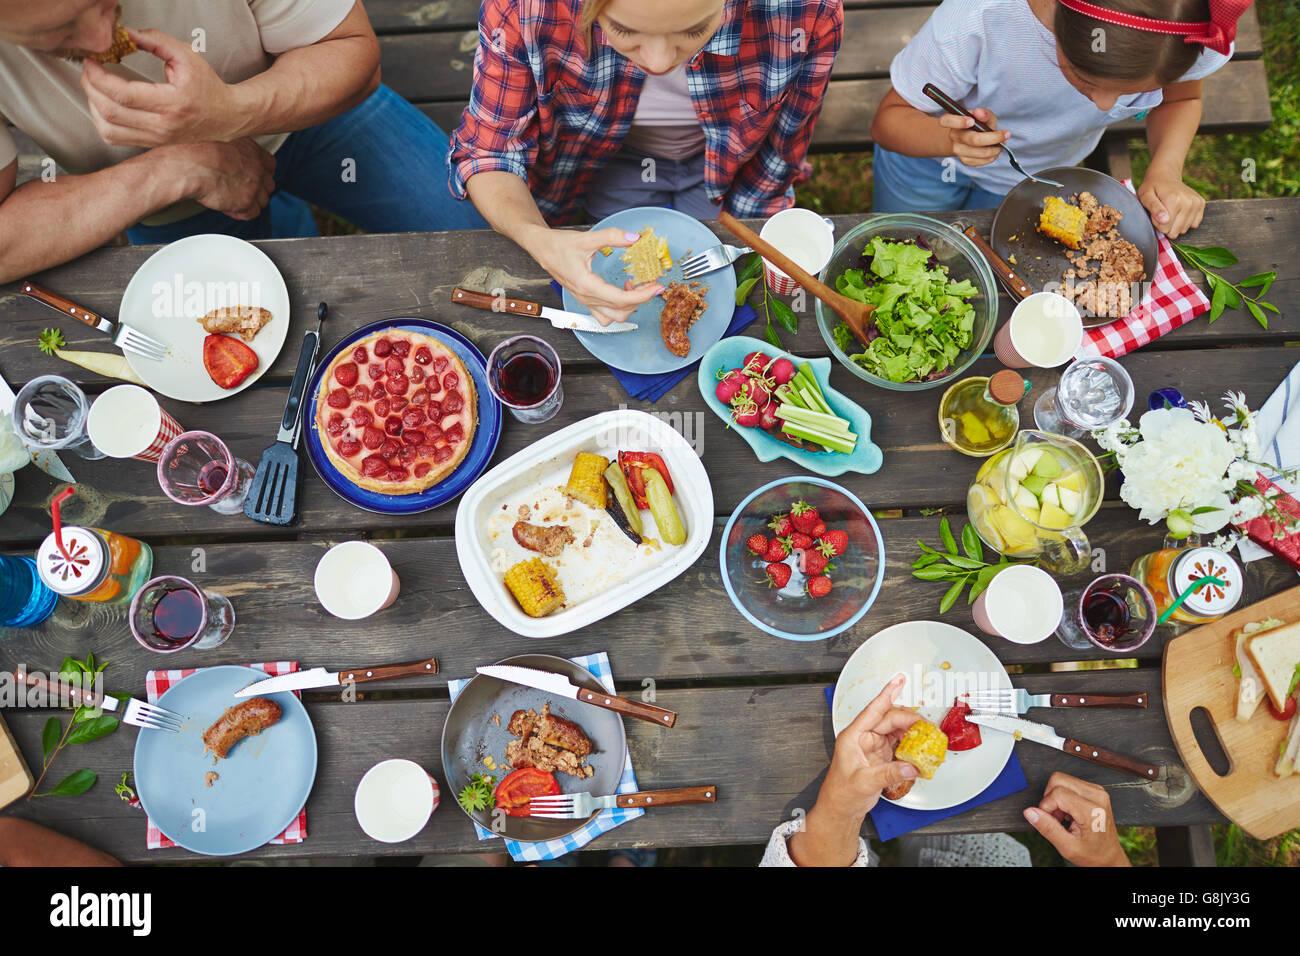 Délicieux dîner Photo Stock